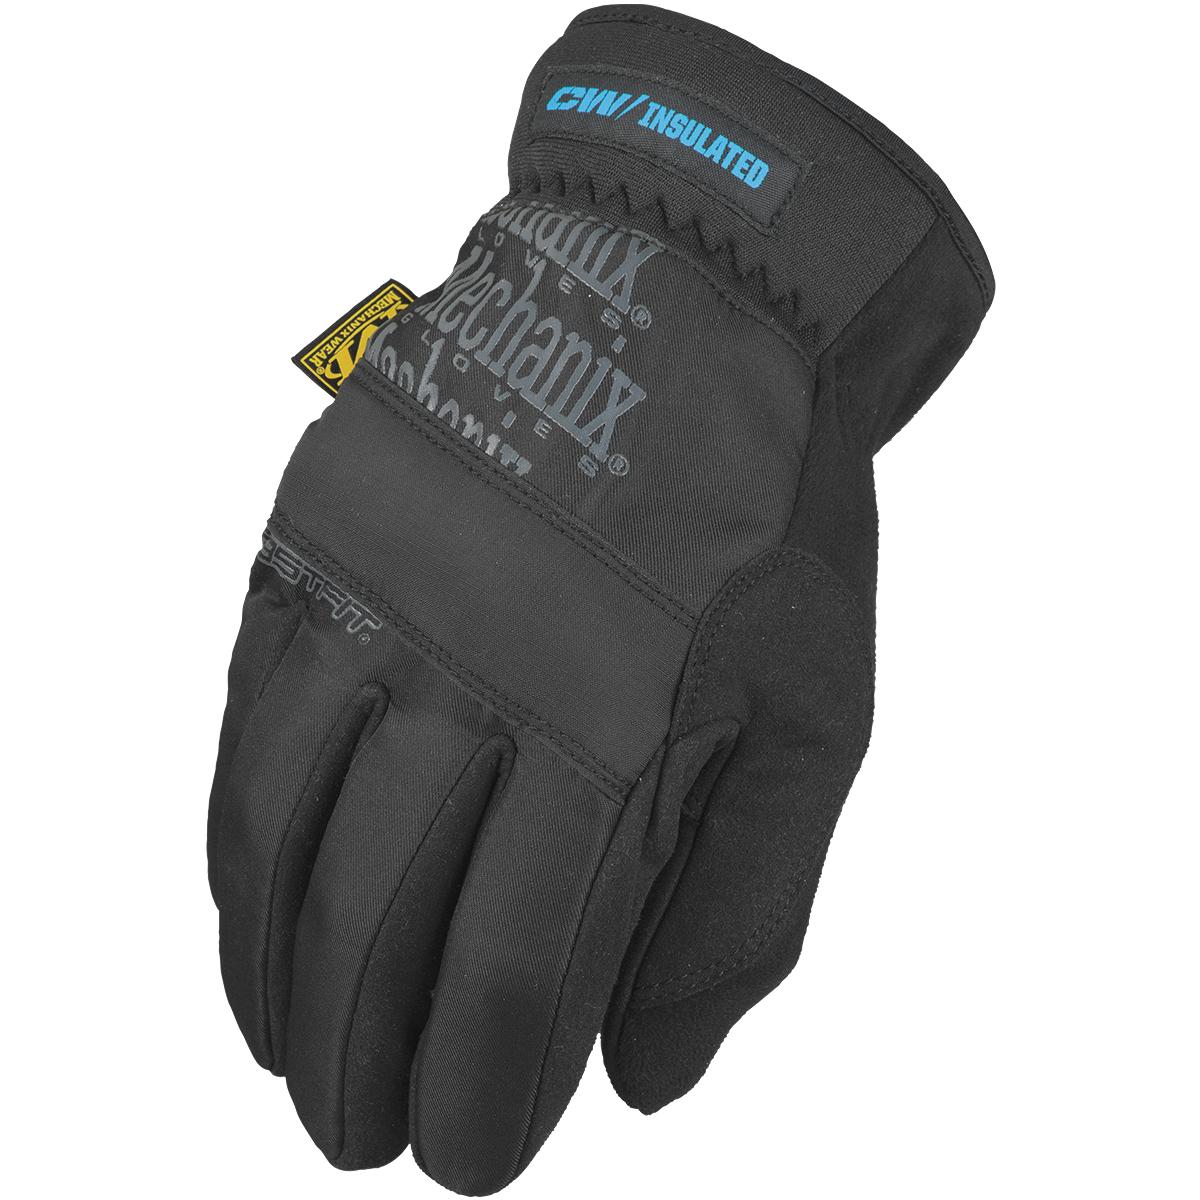 Mechanix Wear Fastfit Isolato Freddo Clima Caldo Guanti